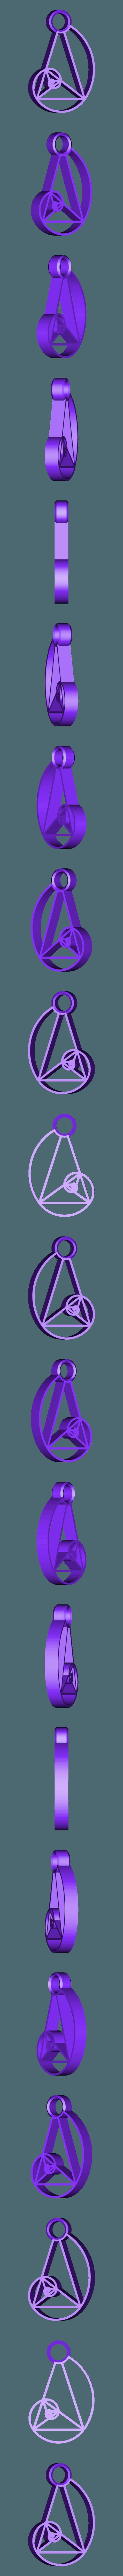 LogaSpiral30mm.stl Download free STL file Logarithmic Spiral, Golden Triangle, Golden Gnomon, Spira Mirabilis • 3D print object, LGBU